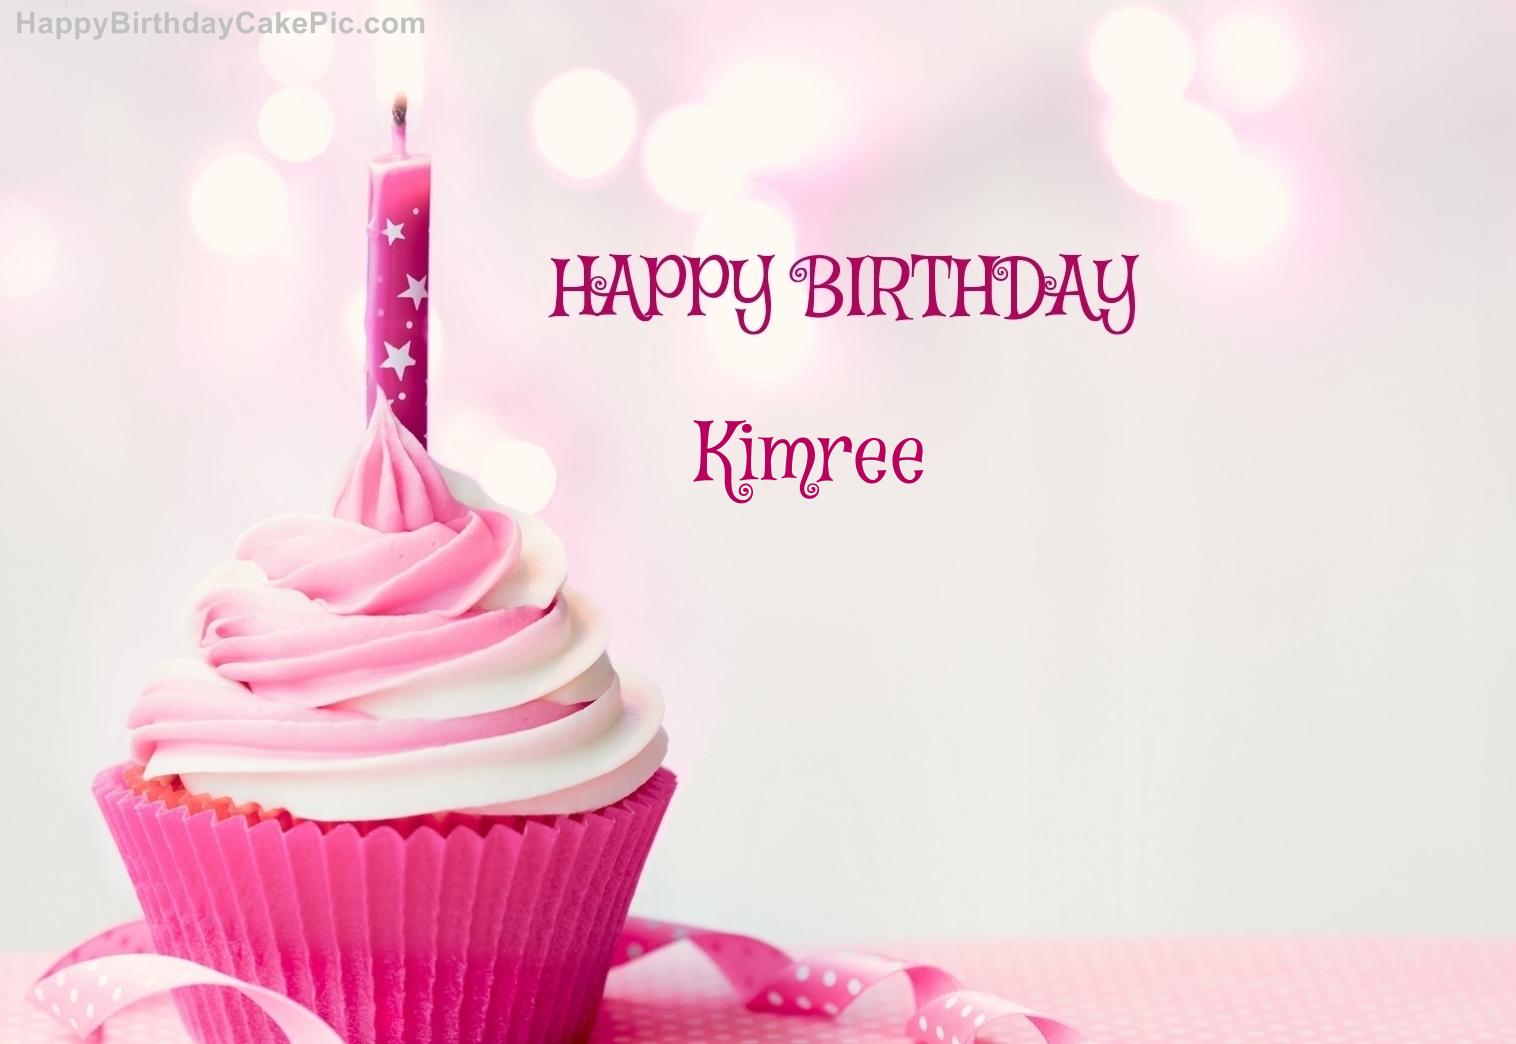 Happy Birthday Cupcake Candle Pink Cake For Kimree